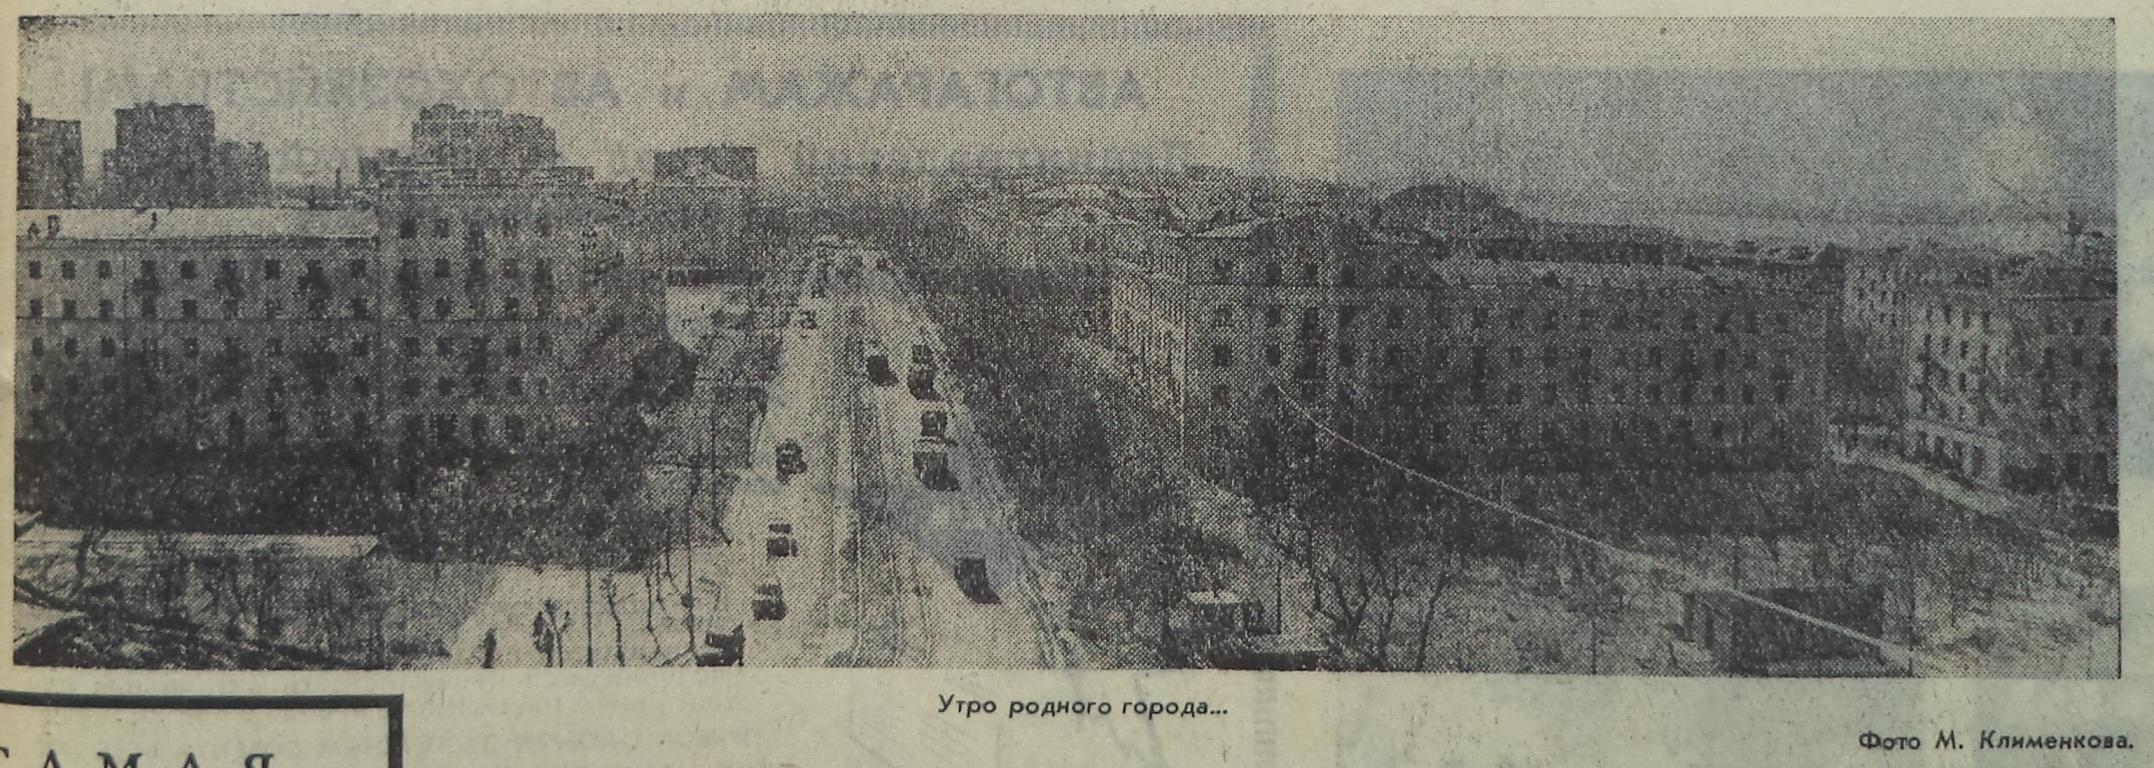 Ново-Садовая-ФОТО-44-ВЗя-1969-04-23-панорама НС от Осип. в город